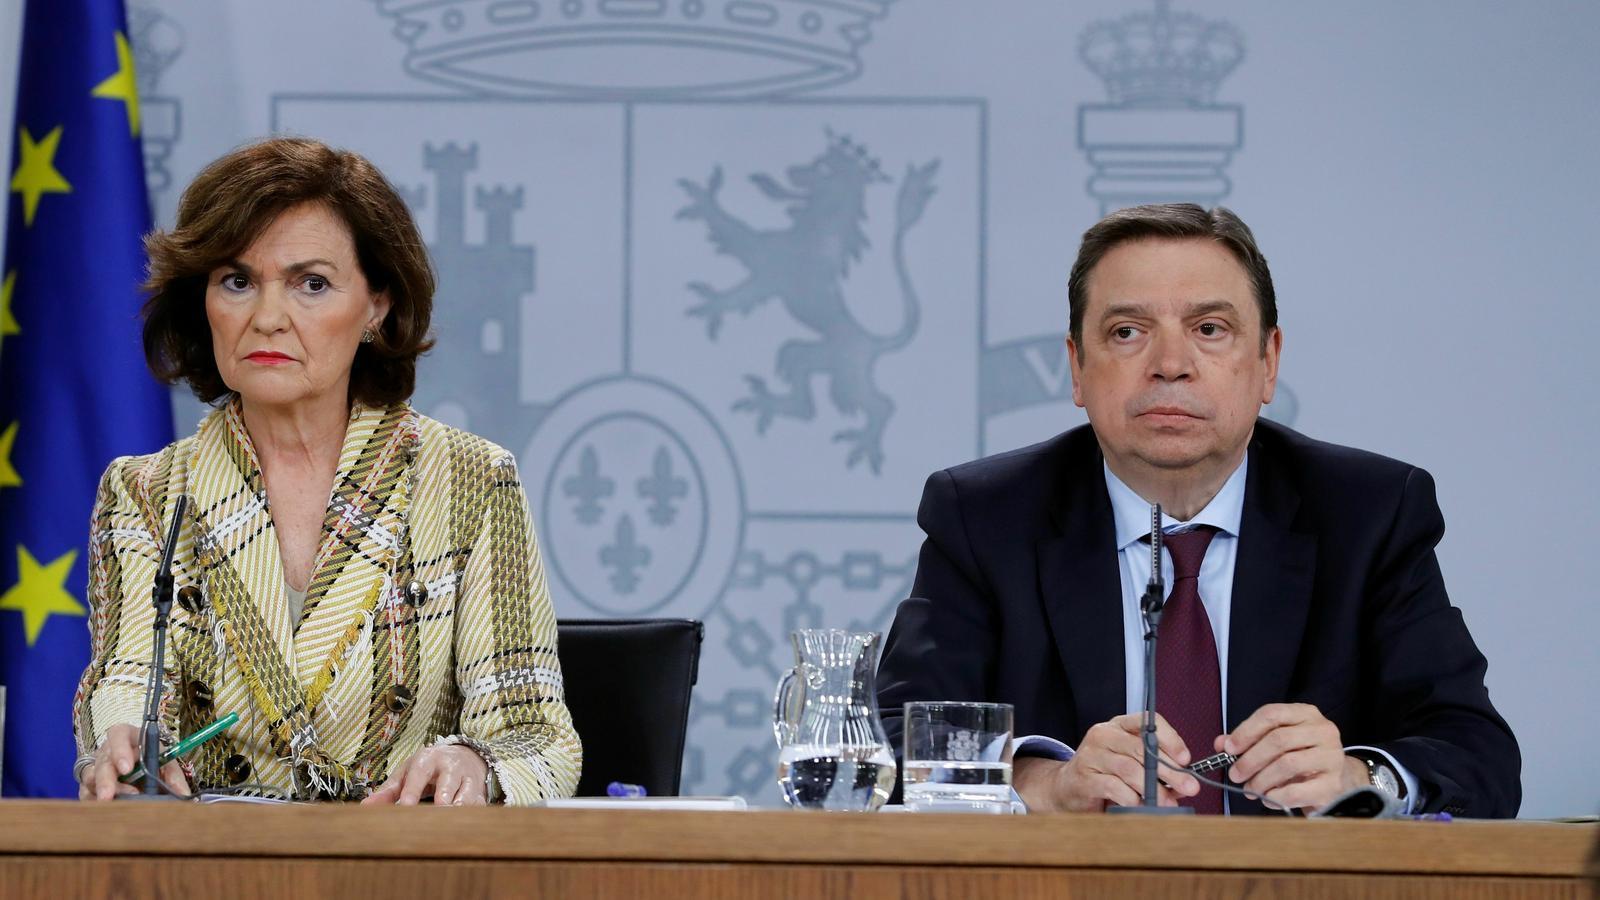 Luis Planas, aquest matí, acompanyat de la Vicepresidenta Carmen Calvo, en roda de premsa